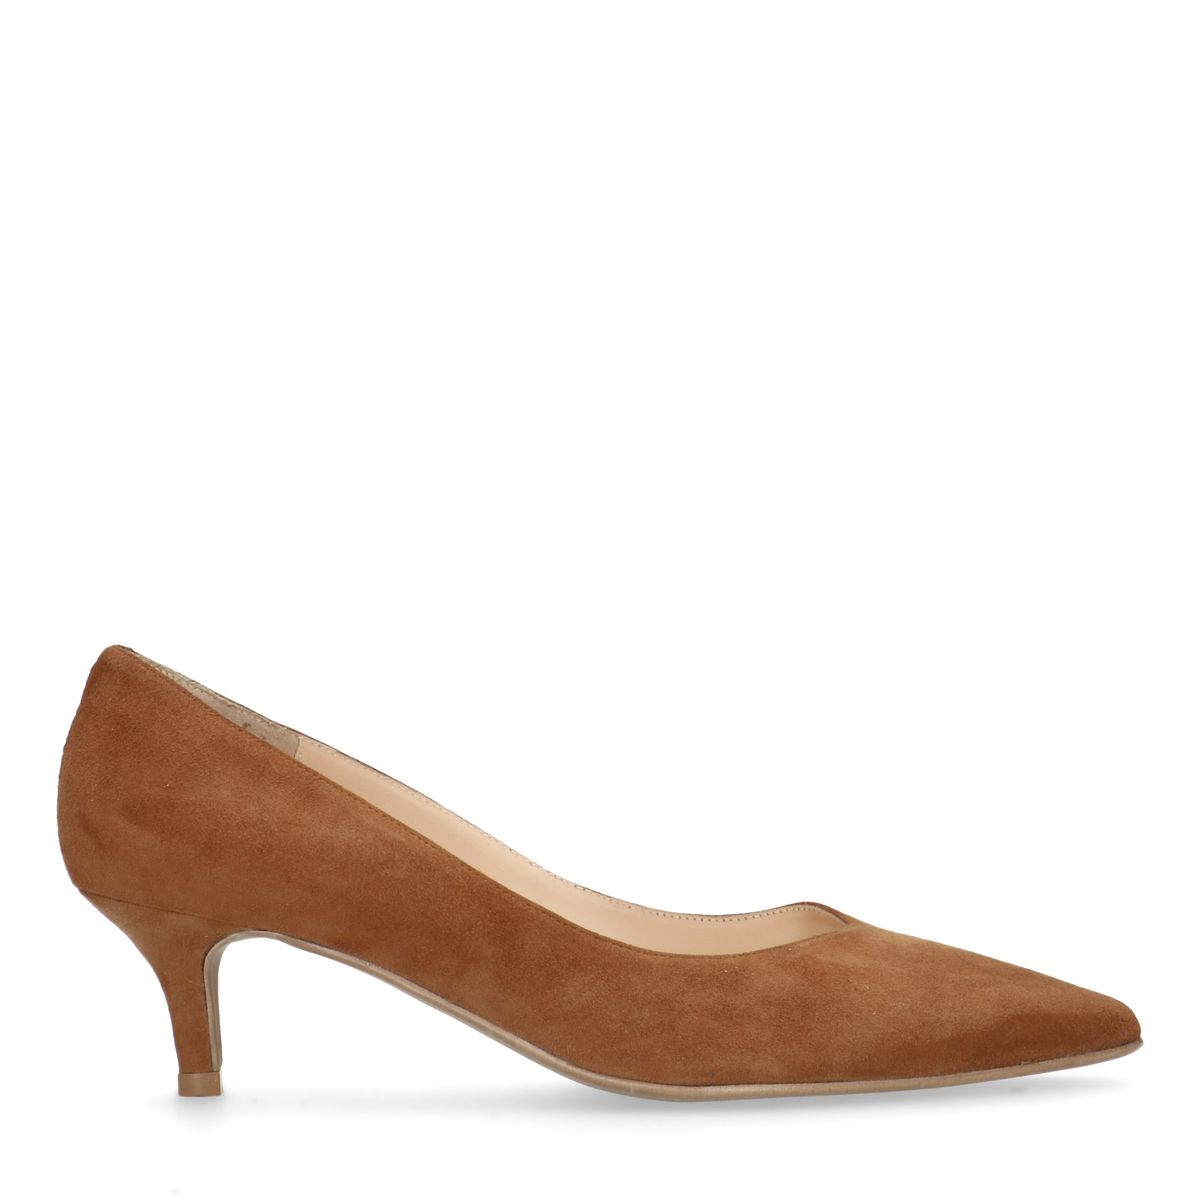 Escarpins en daim avec petit talon - marron (Maat 36)